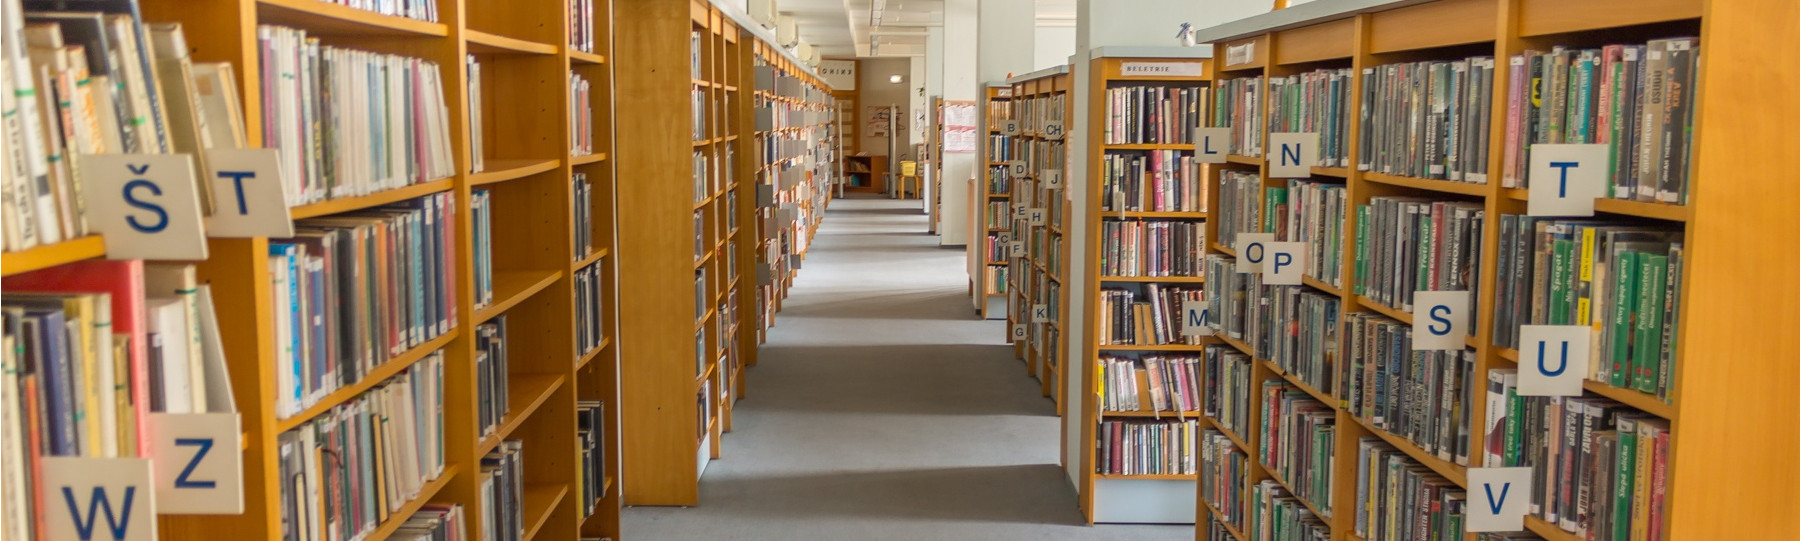 knihovna-pro-web